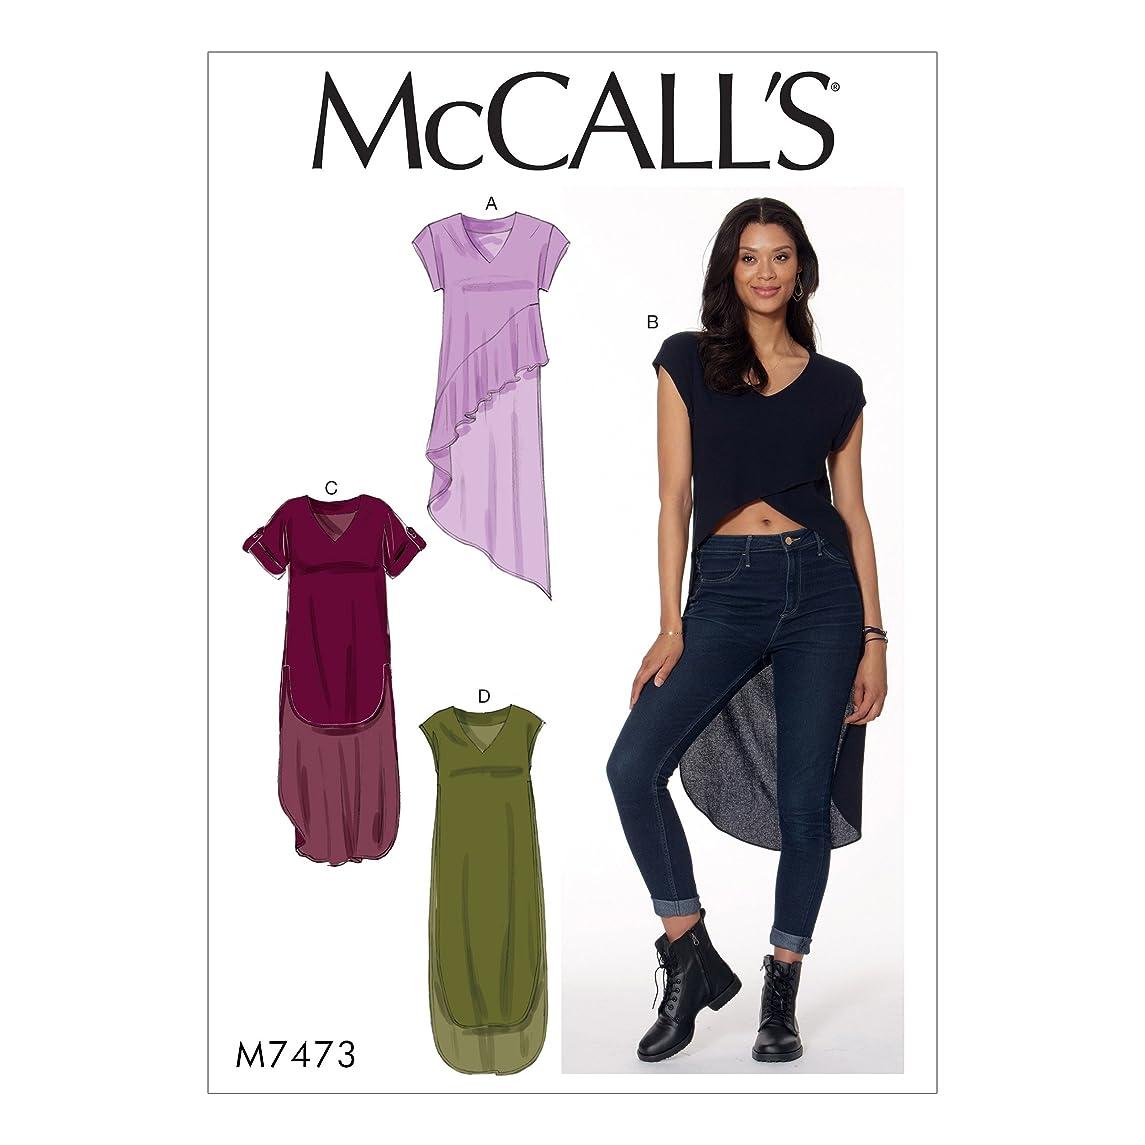 MCCALLS M7473 (SIZE 14-22) Misses' V-Neck, High-Low Hem TunicsS SEWING PATTERN